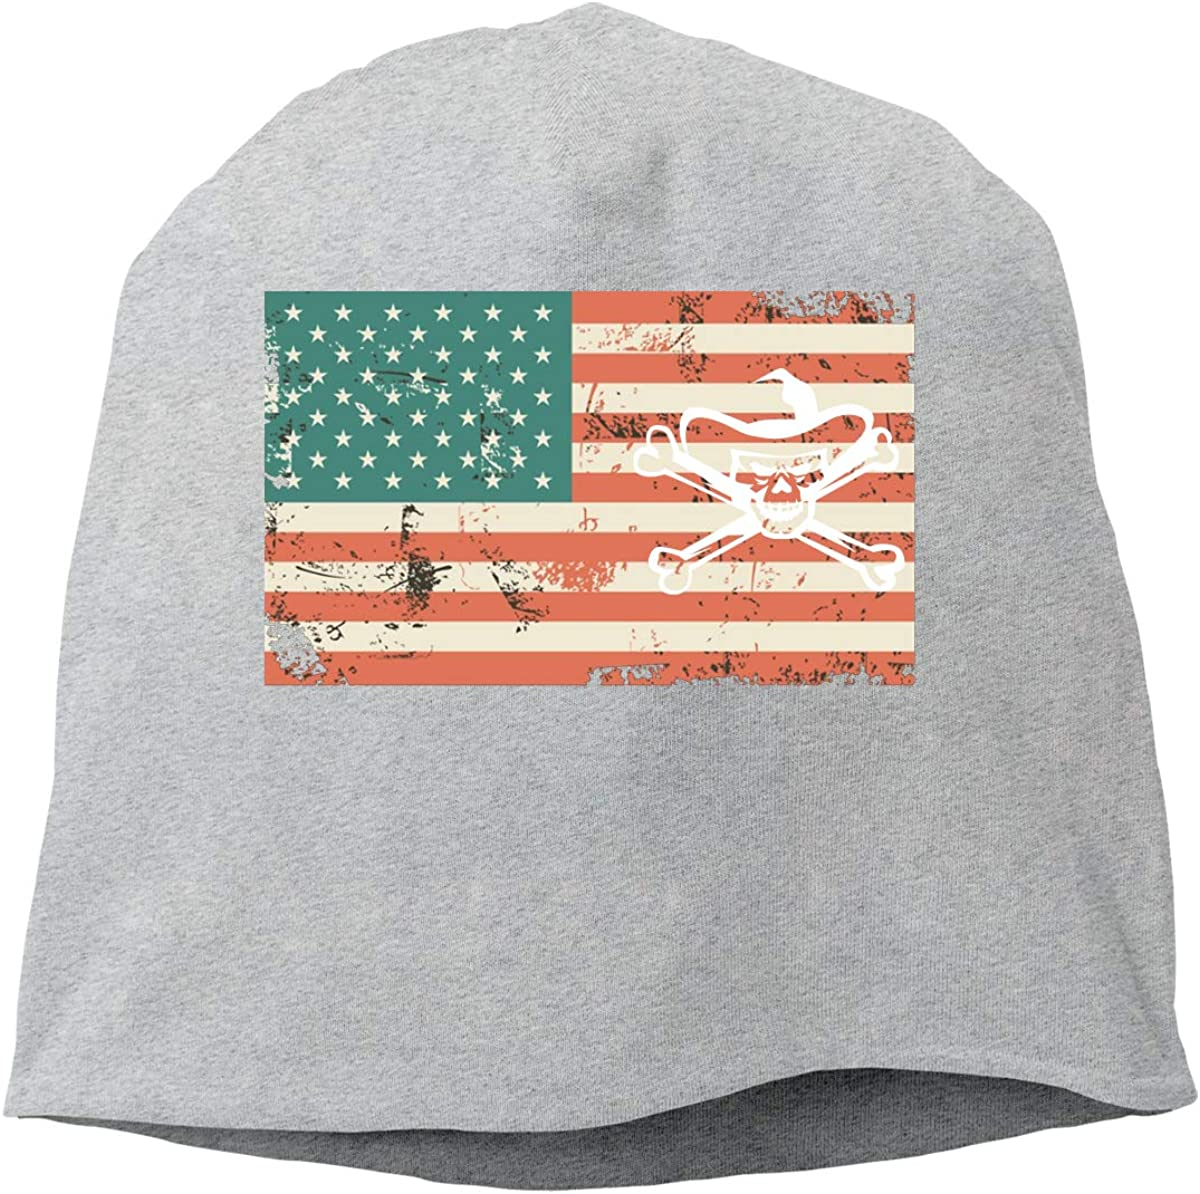 Cowboy Pirate Skull US Flag Unisex Knitted Hat Beanie Hat Warm Hats Skull Cap